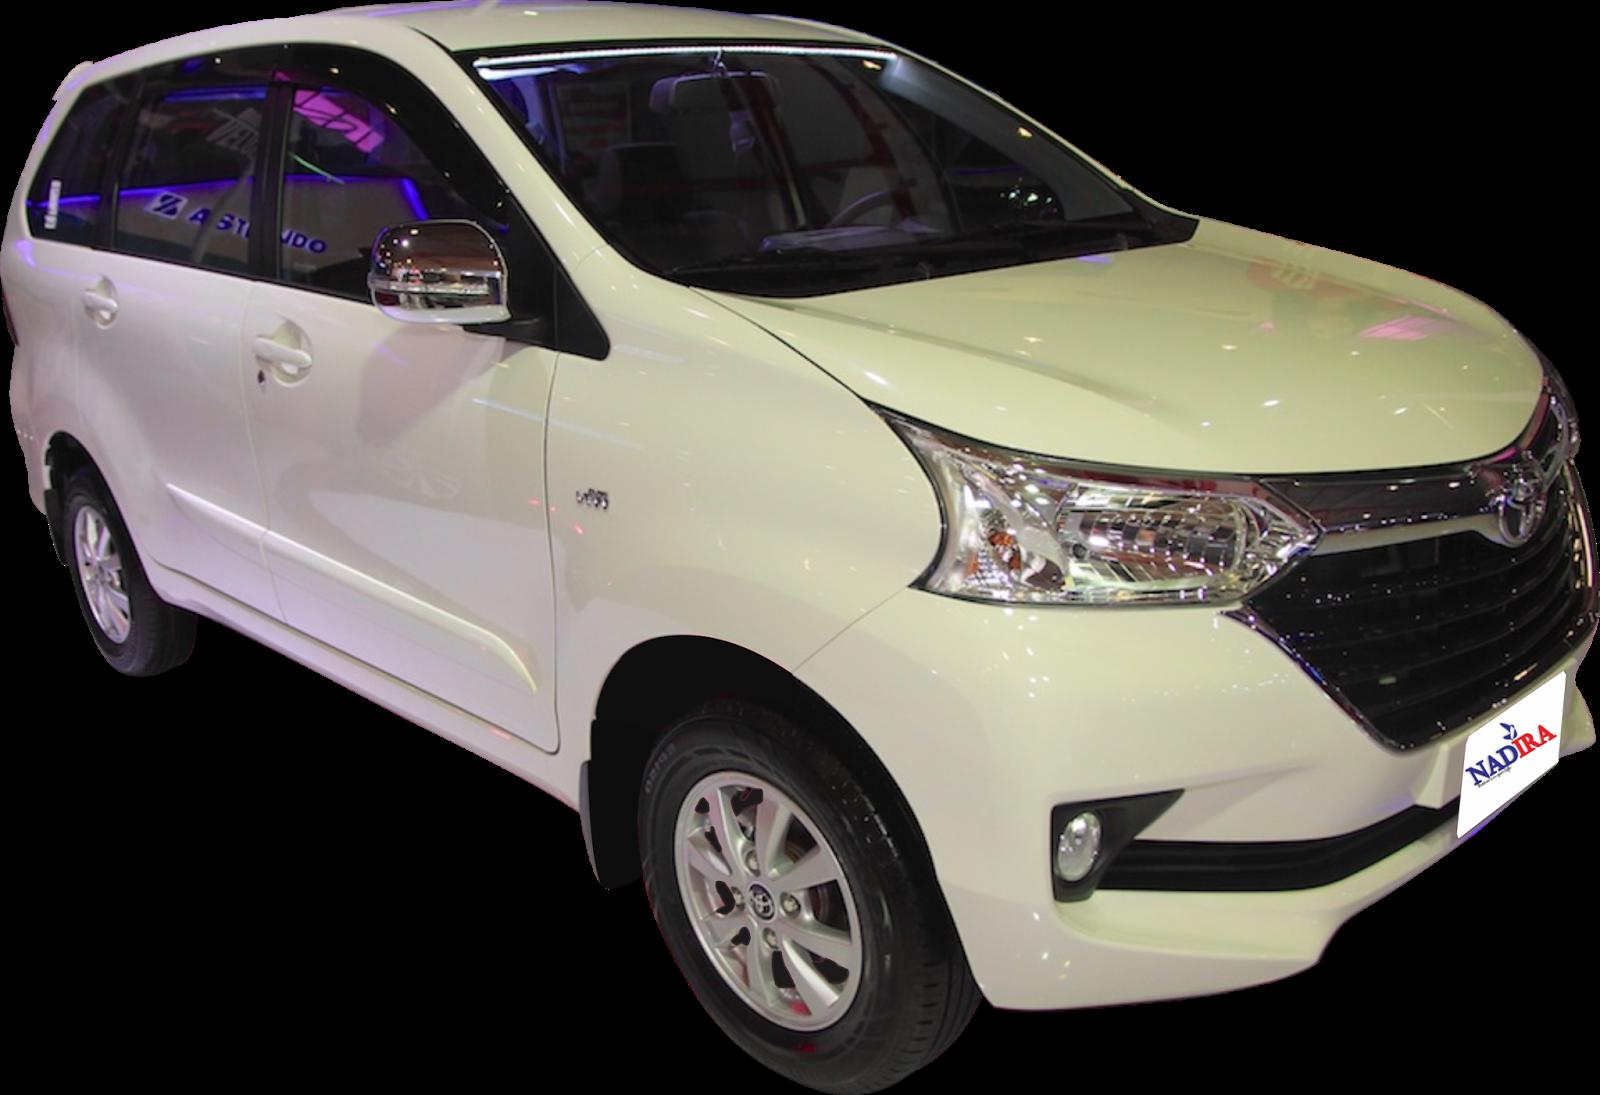 Grand New Avanza Warna Grey Metallic Yogyakarta Pusat Rental Mobil Murah Samarinda 250ribu